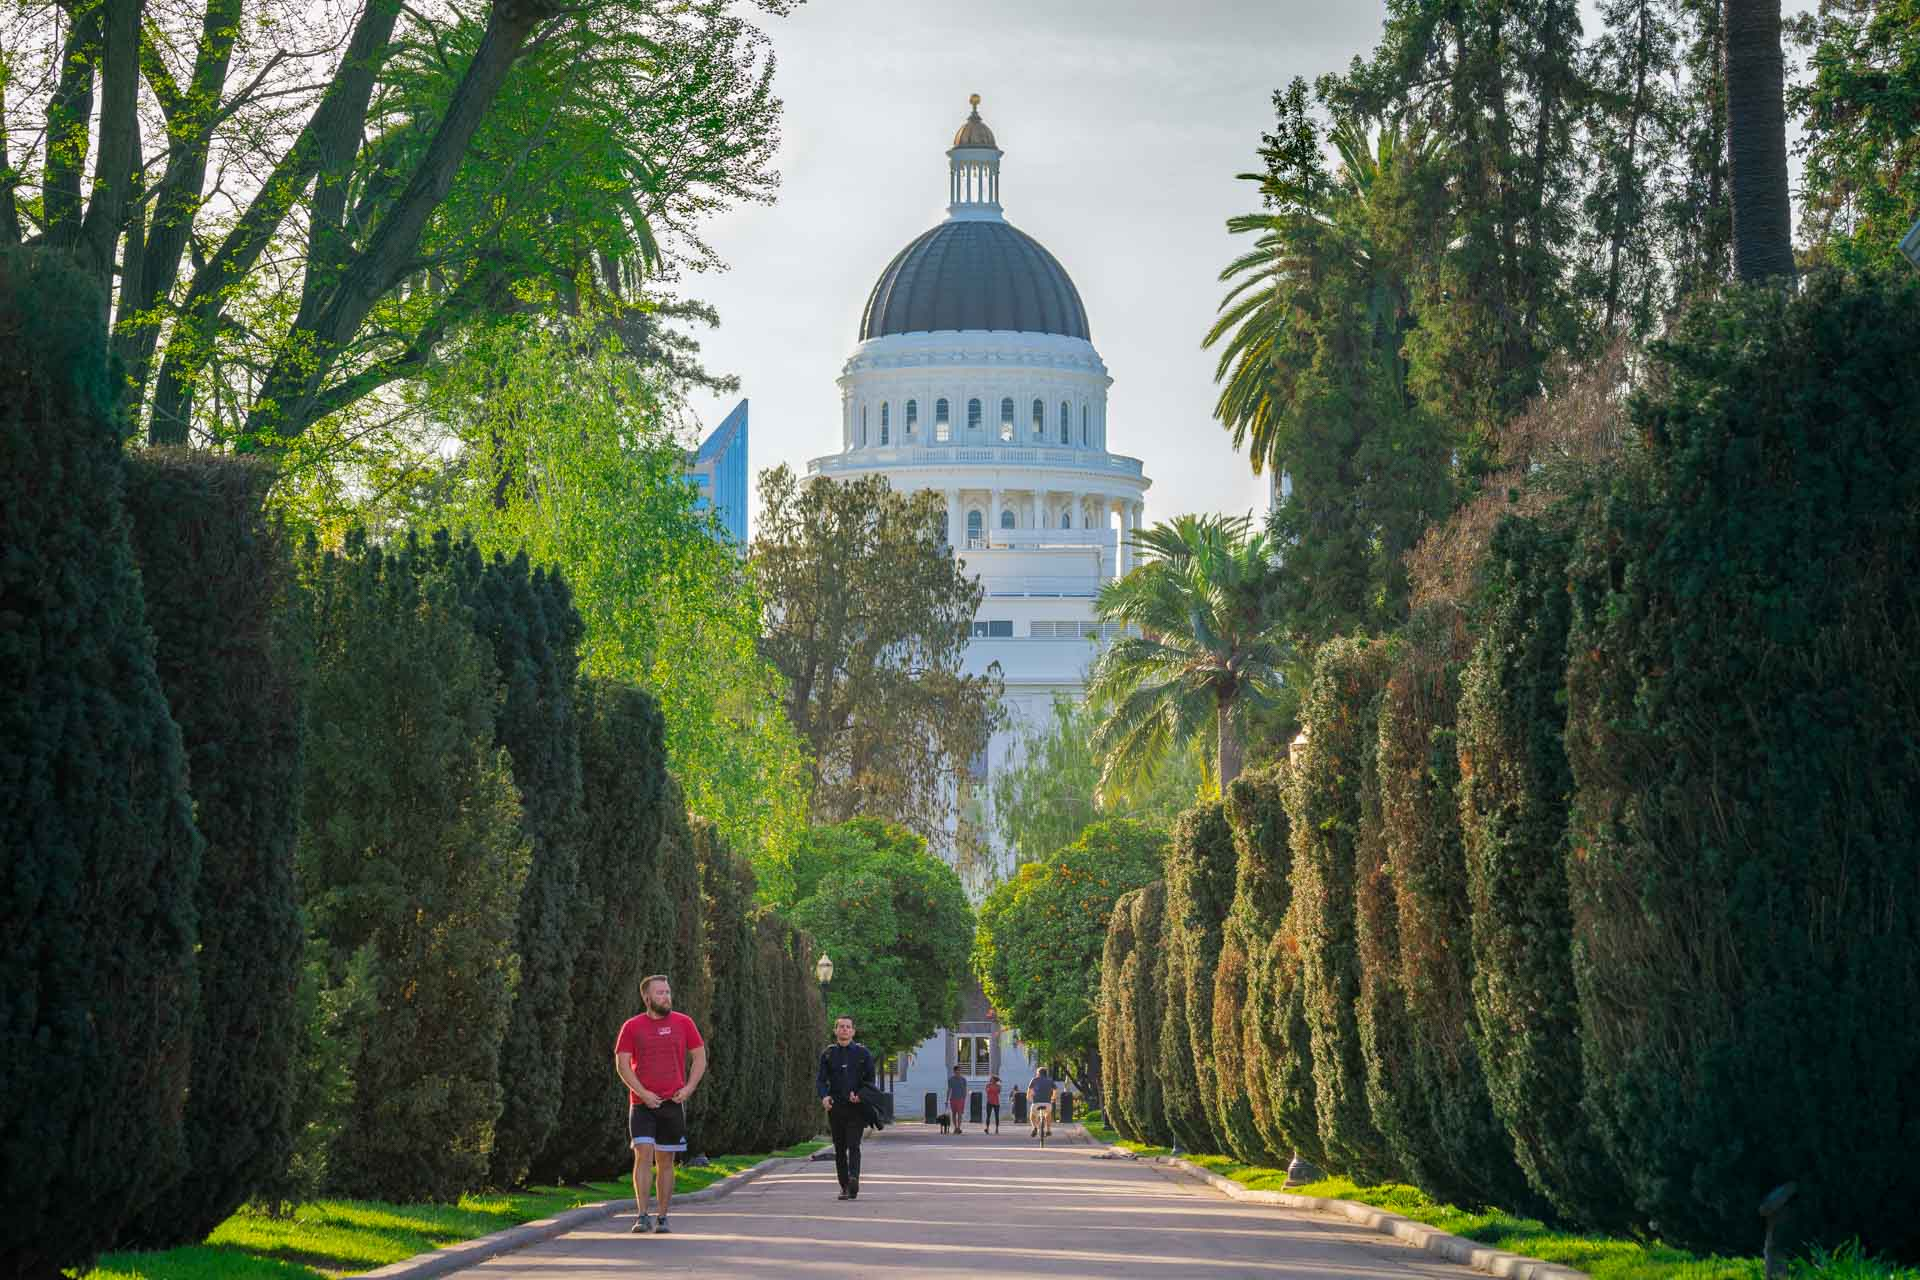 California's State Capitol building in Sacramento, CA